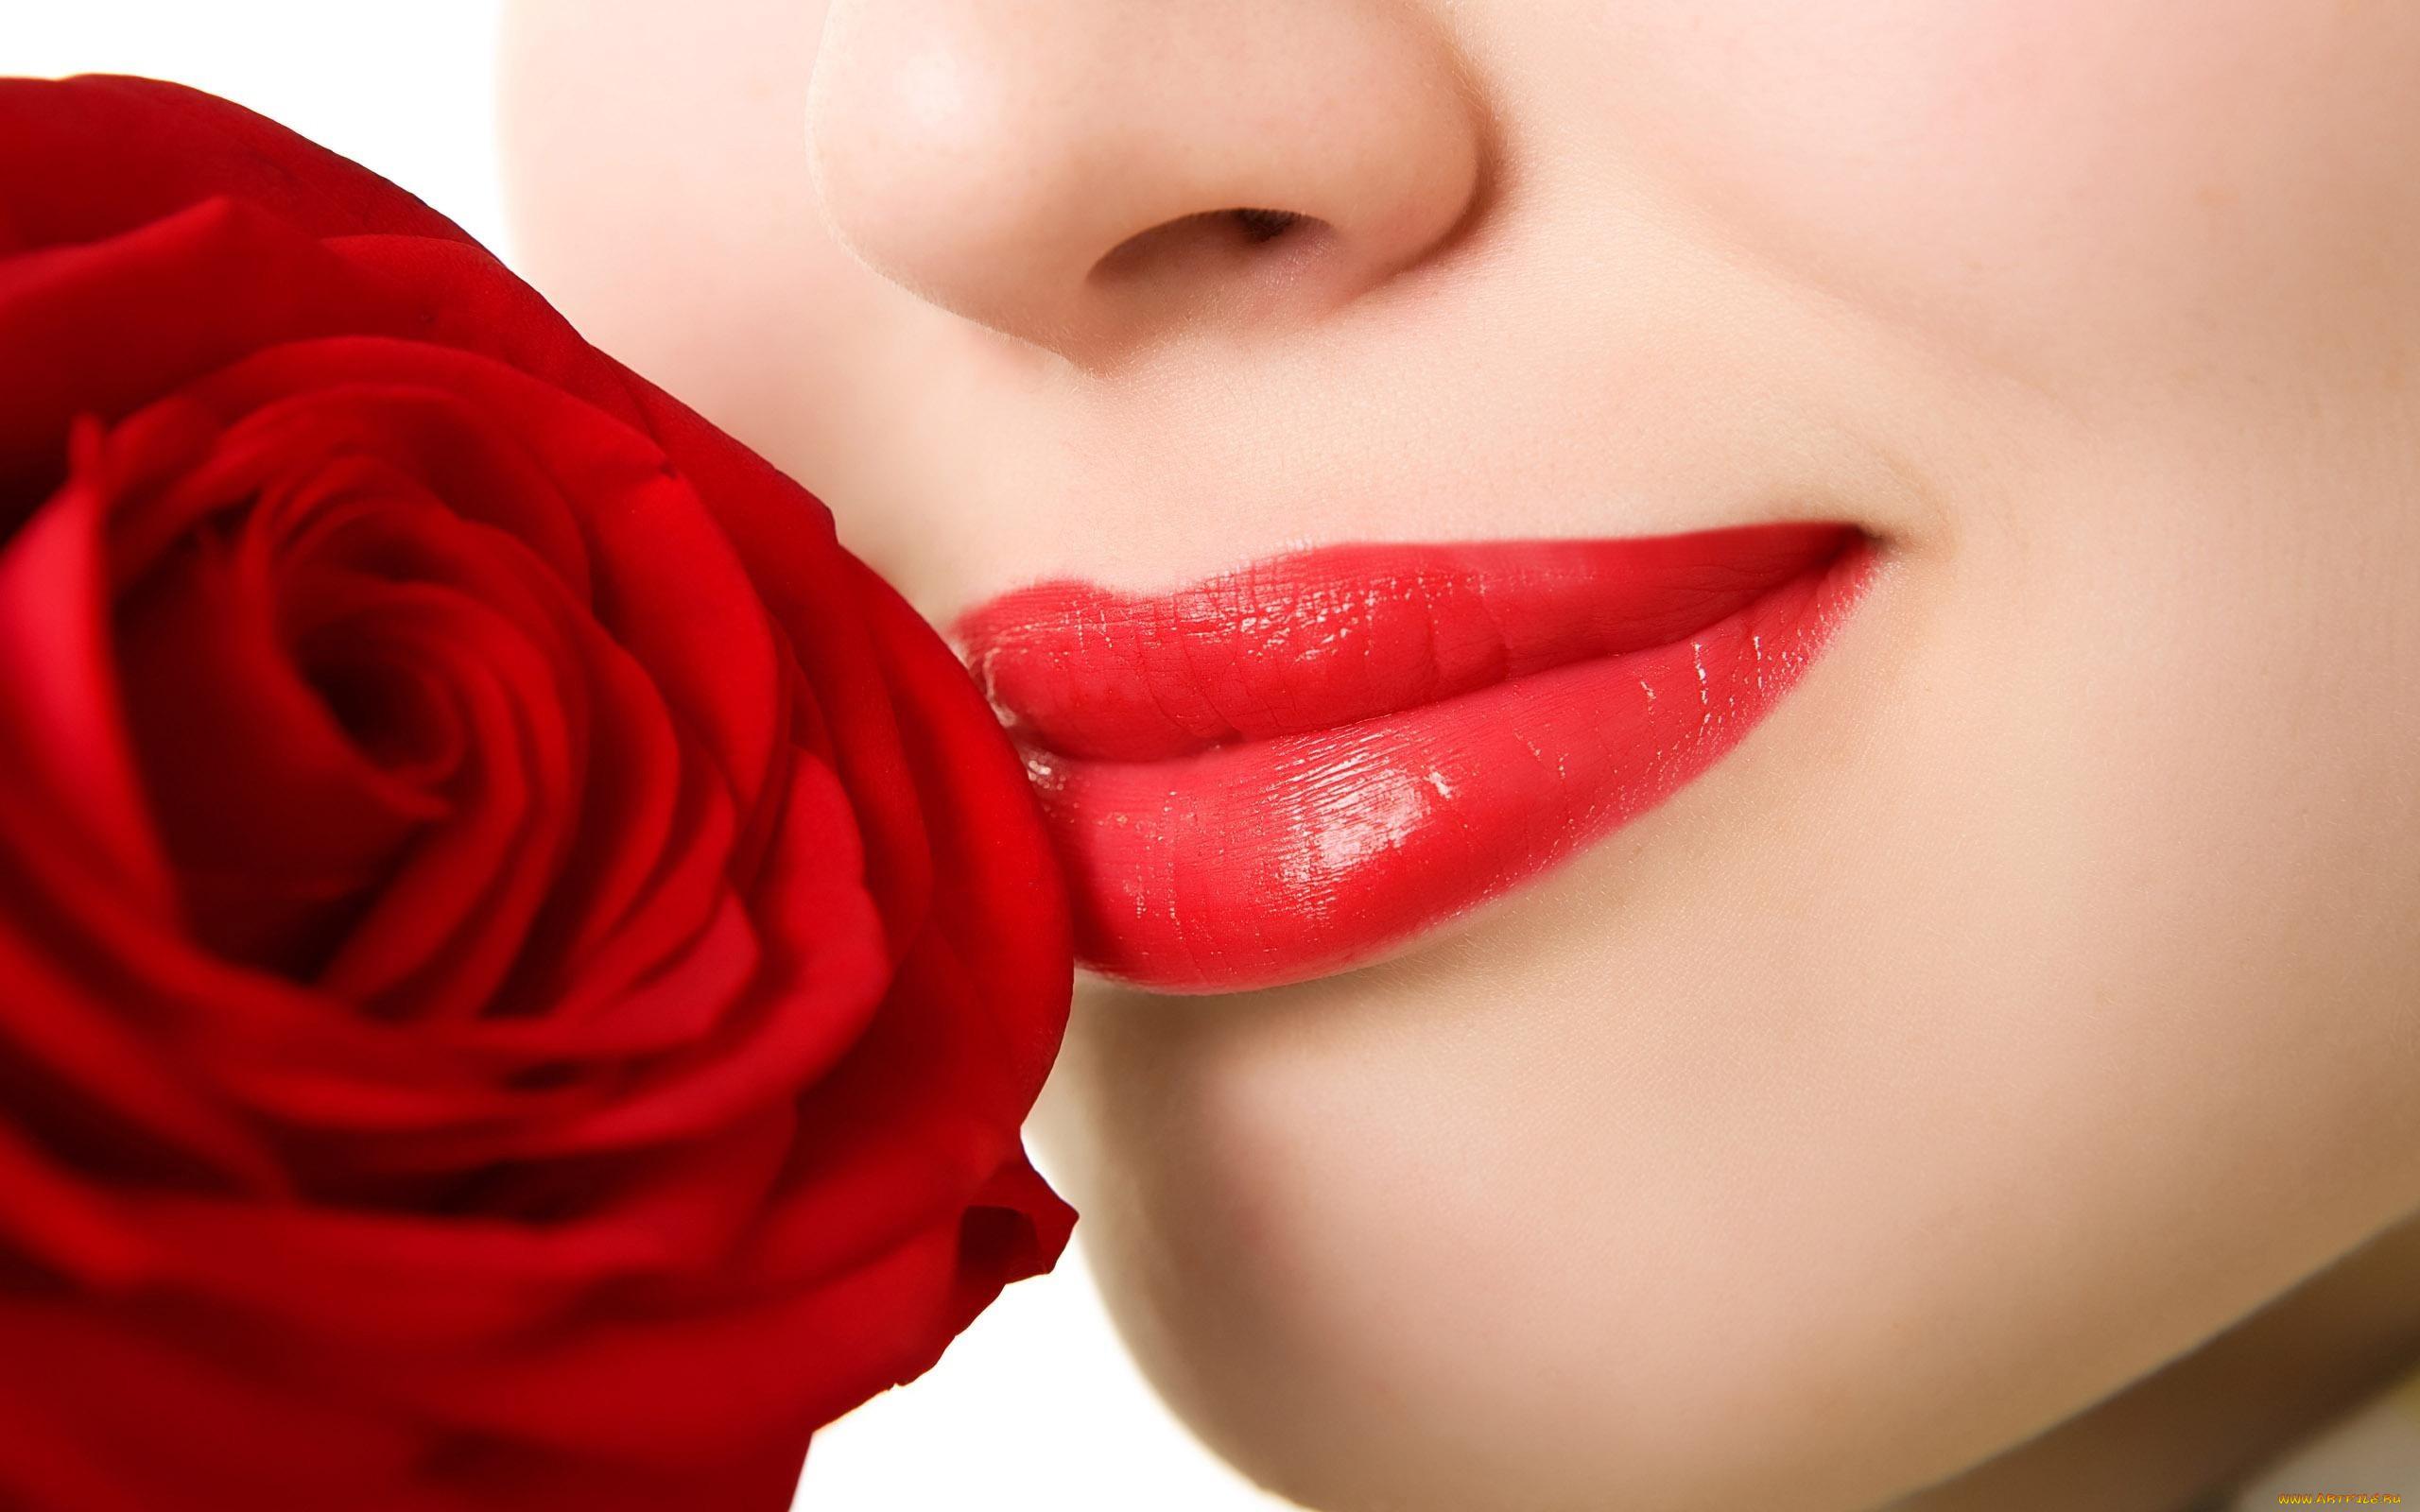 Фото цветов и поцелуев